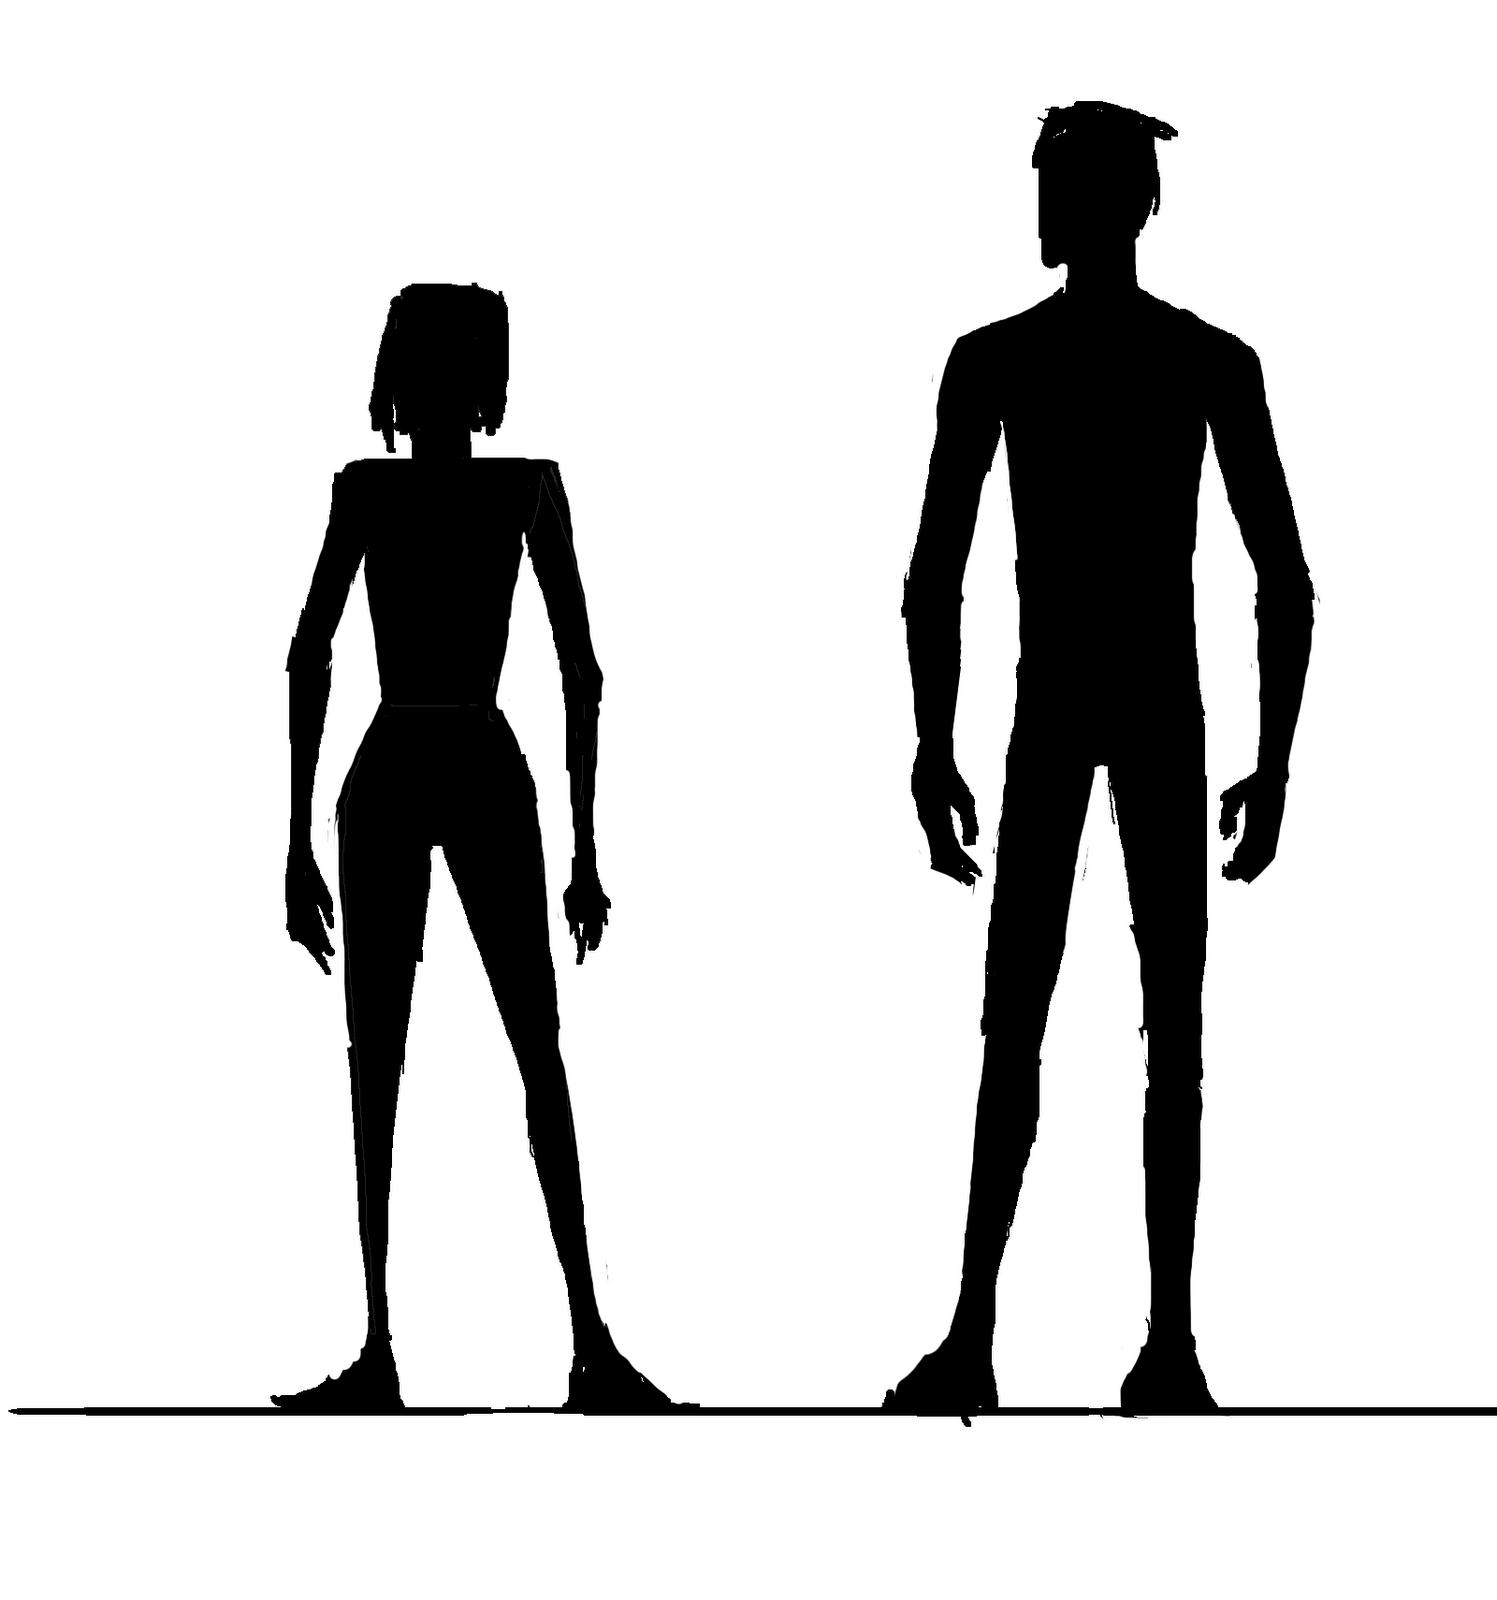 1497x1600 Shadow Silhouette Of Woman With Slim Body Dancing. Shadow Dancer